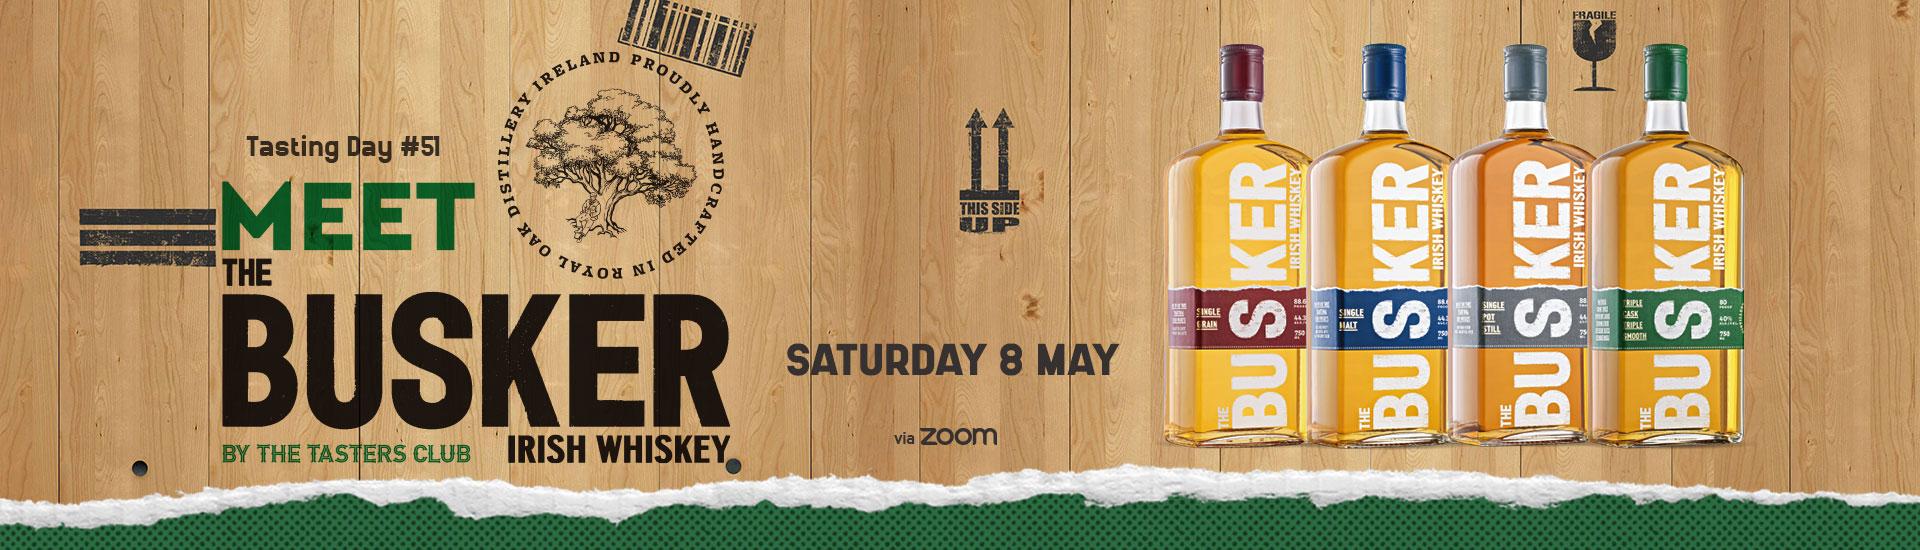 the tasters club busker irish whiskey tasting